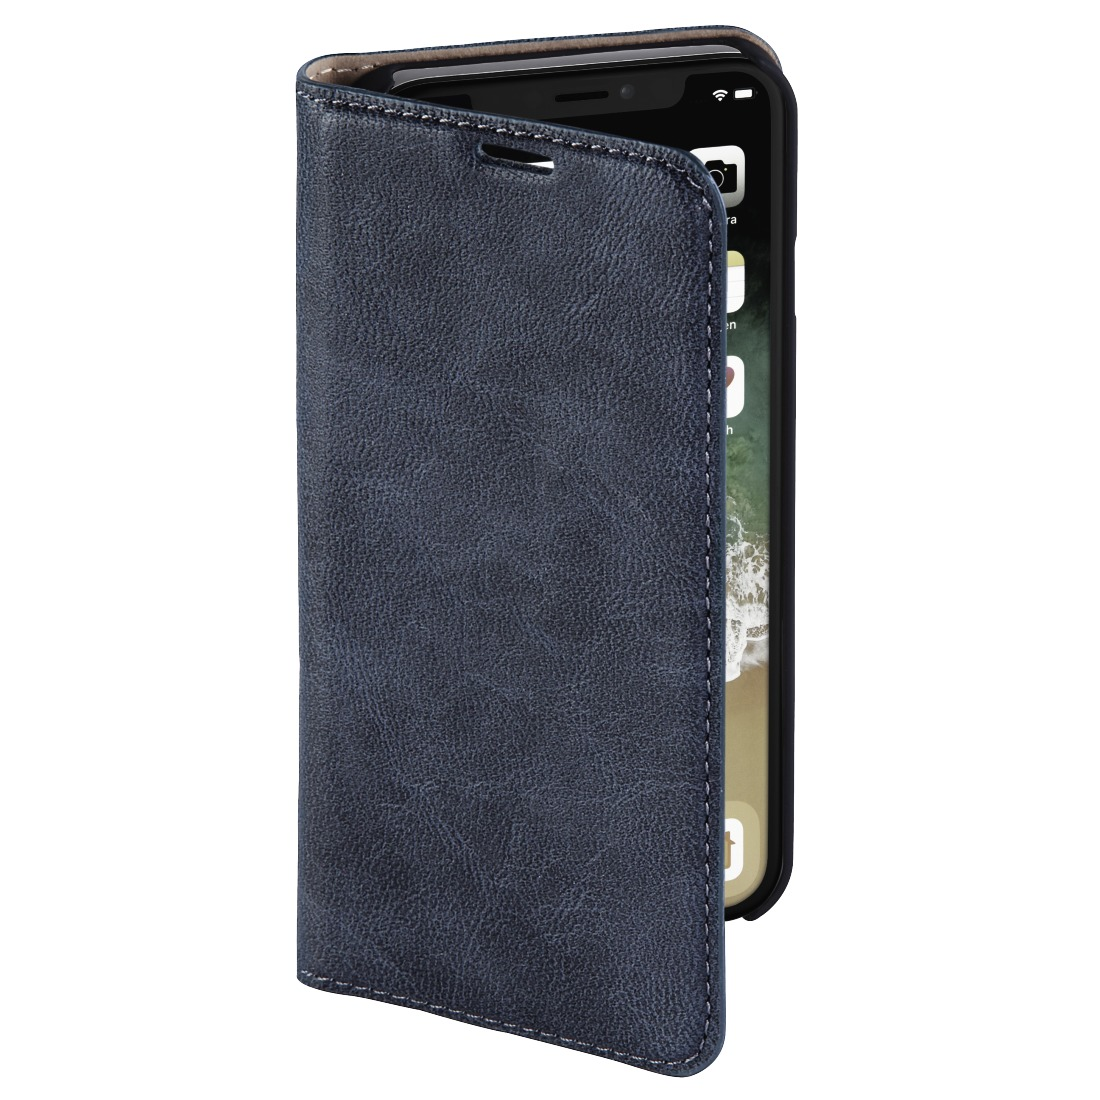 Hama telefoonhoesje Booklet guard Iphone XS MAX blauw